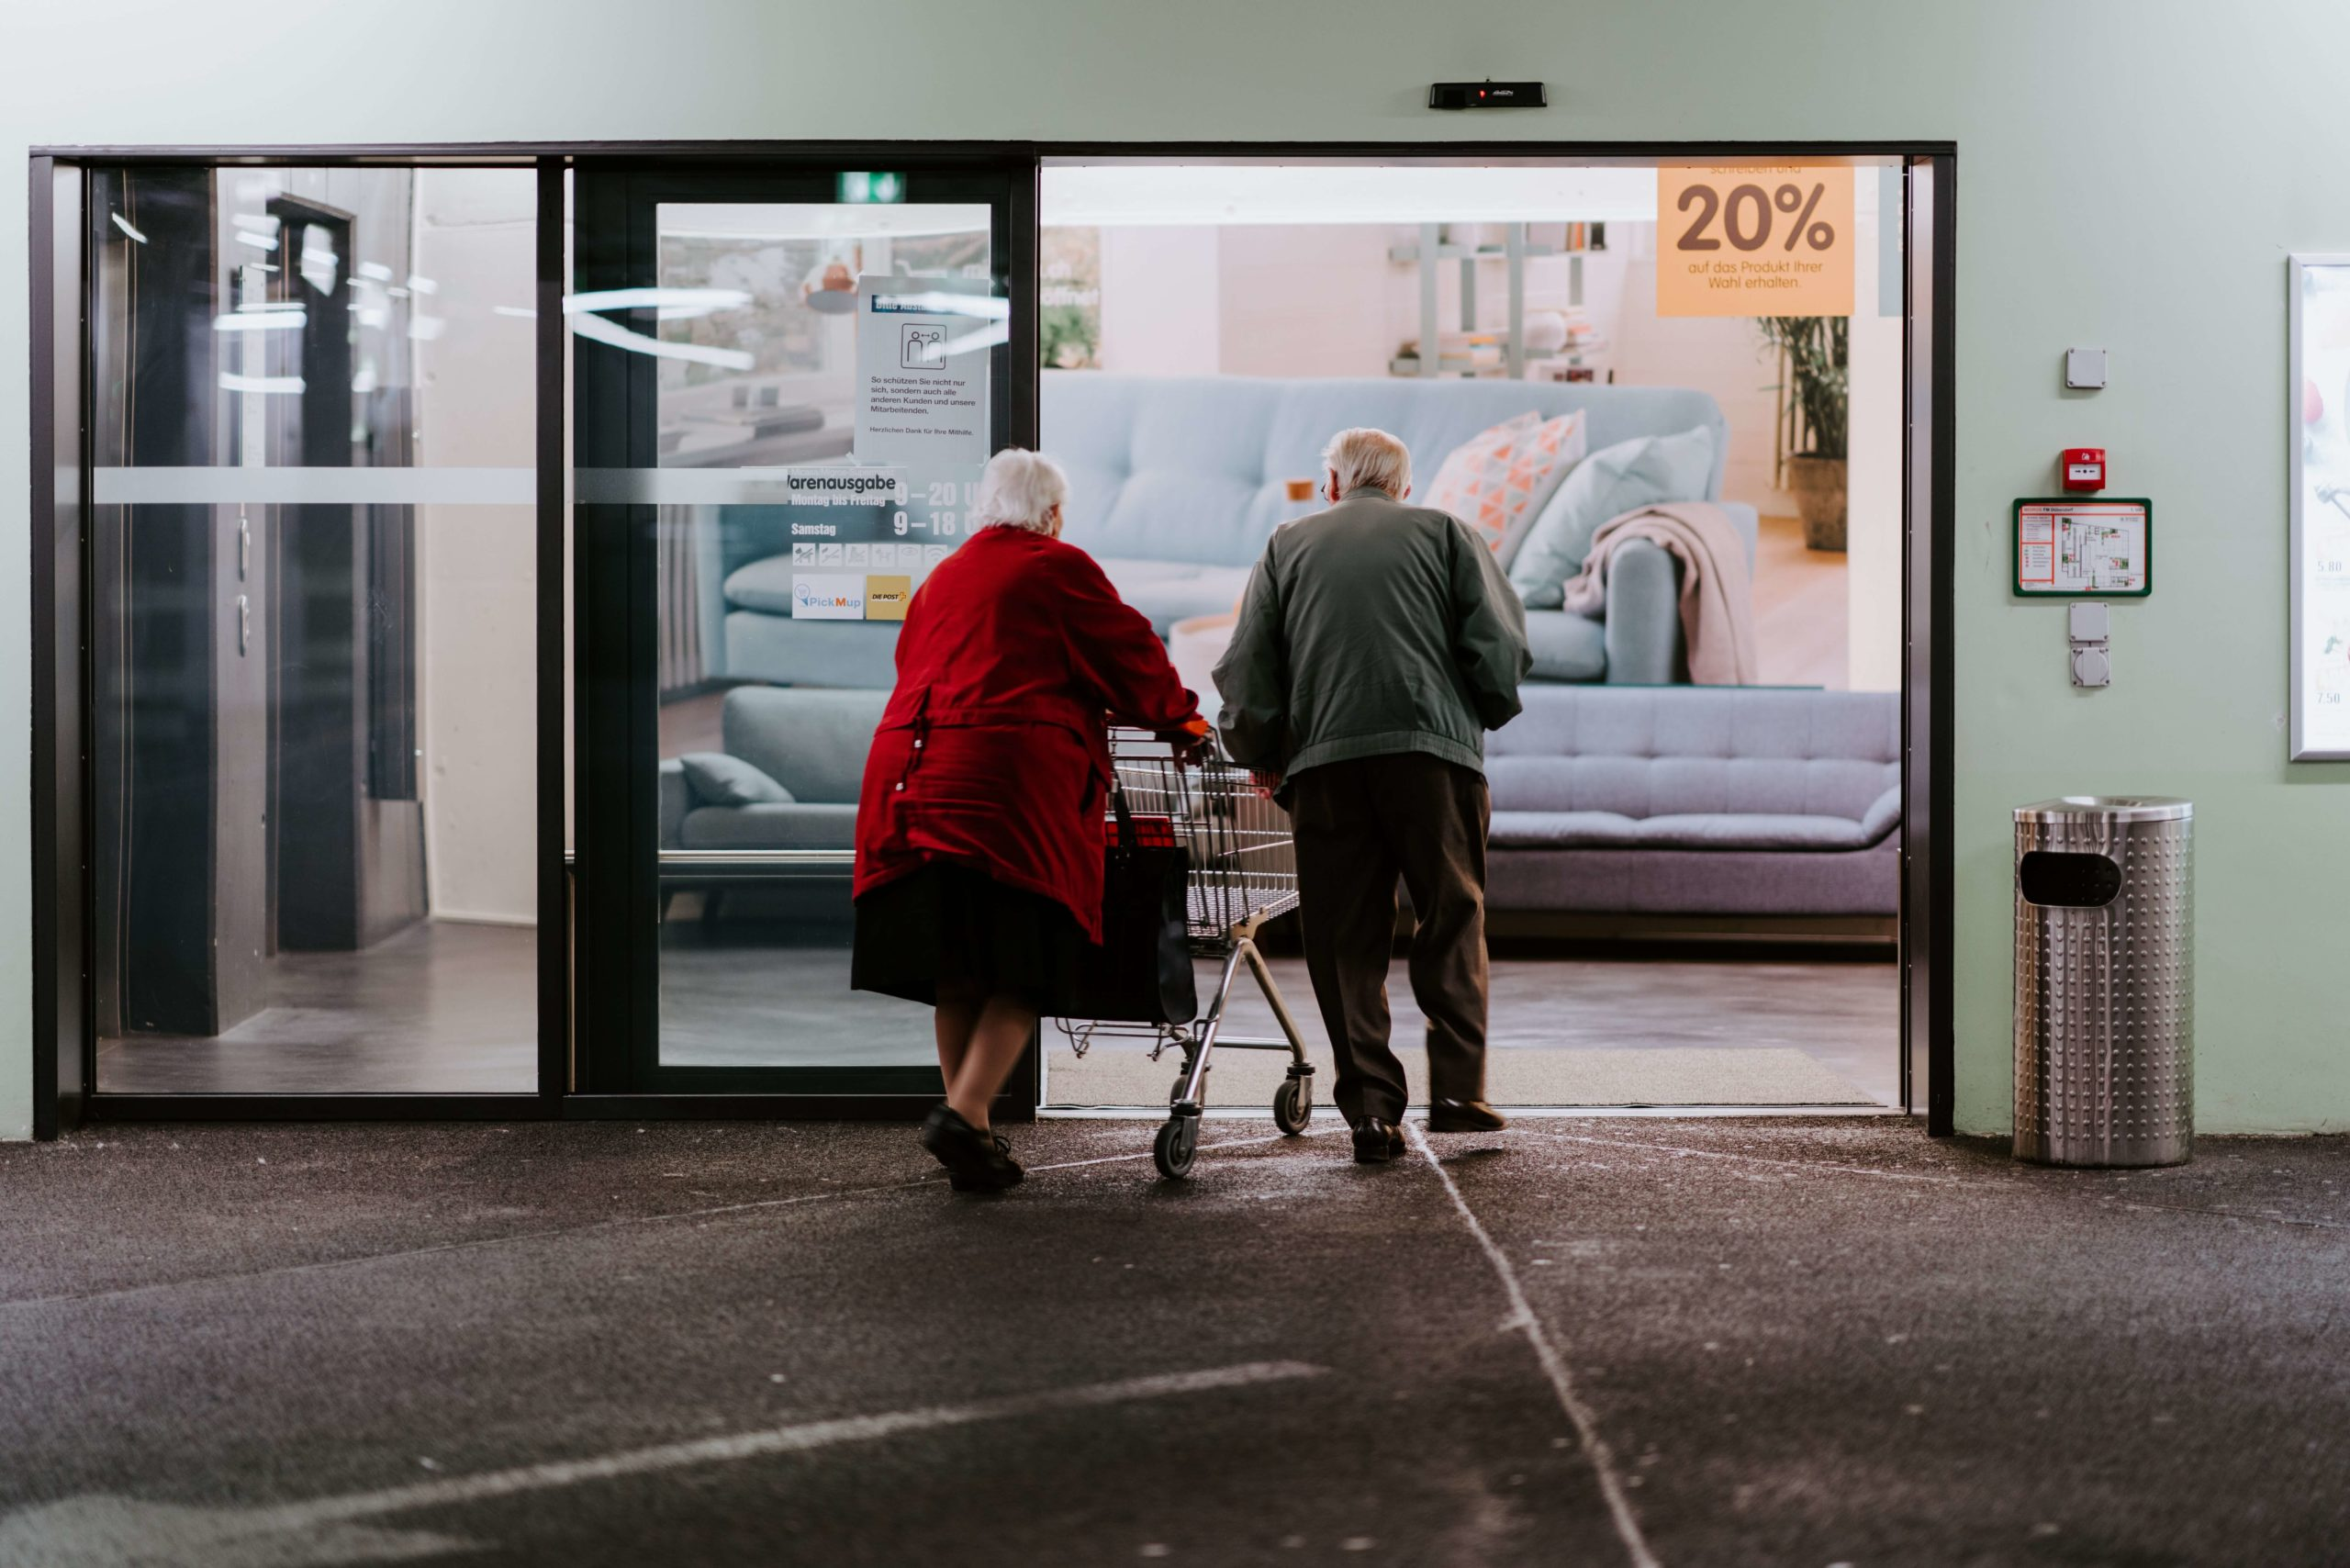 Seniors walking inside a store